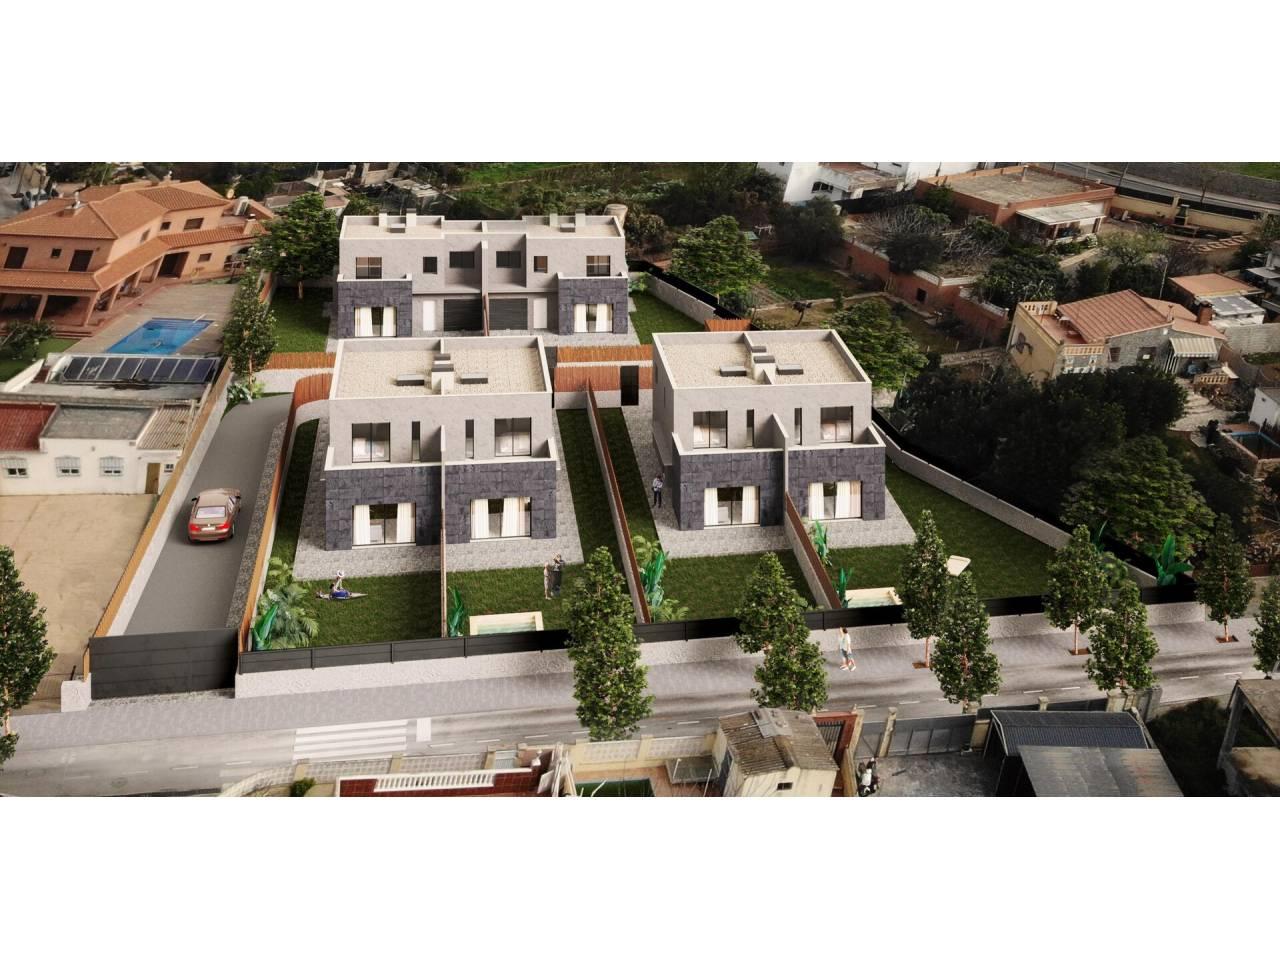 Casa pareada / Barcelona / Vilanova i la Geltrú / La Collada-Els Sis Camins-Fondo Somella-Santa Mari